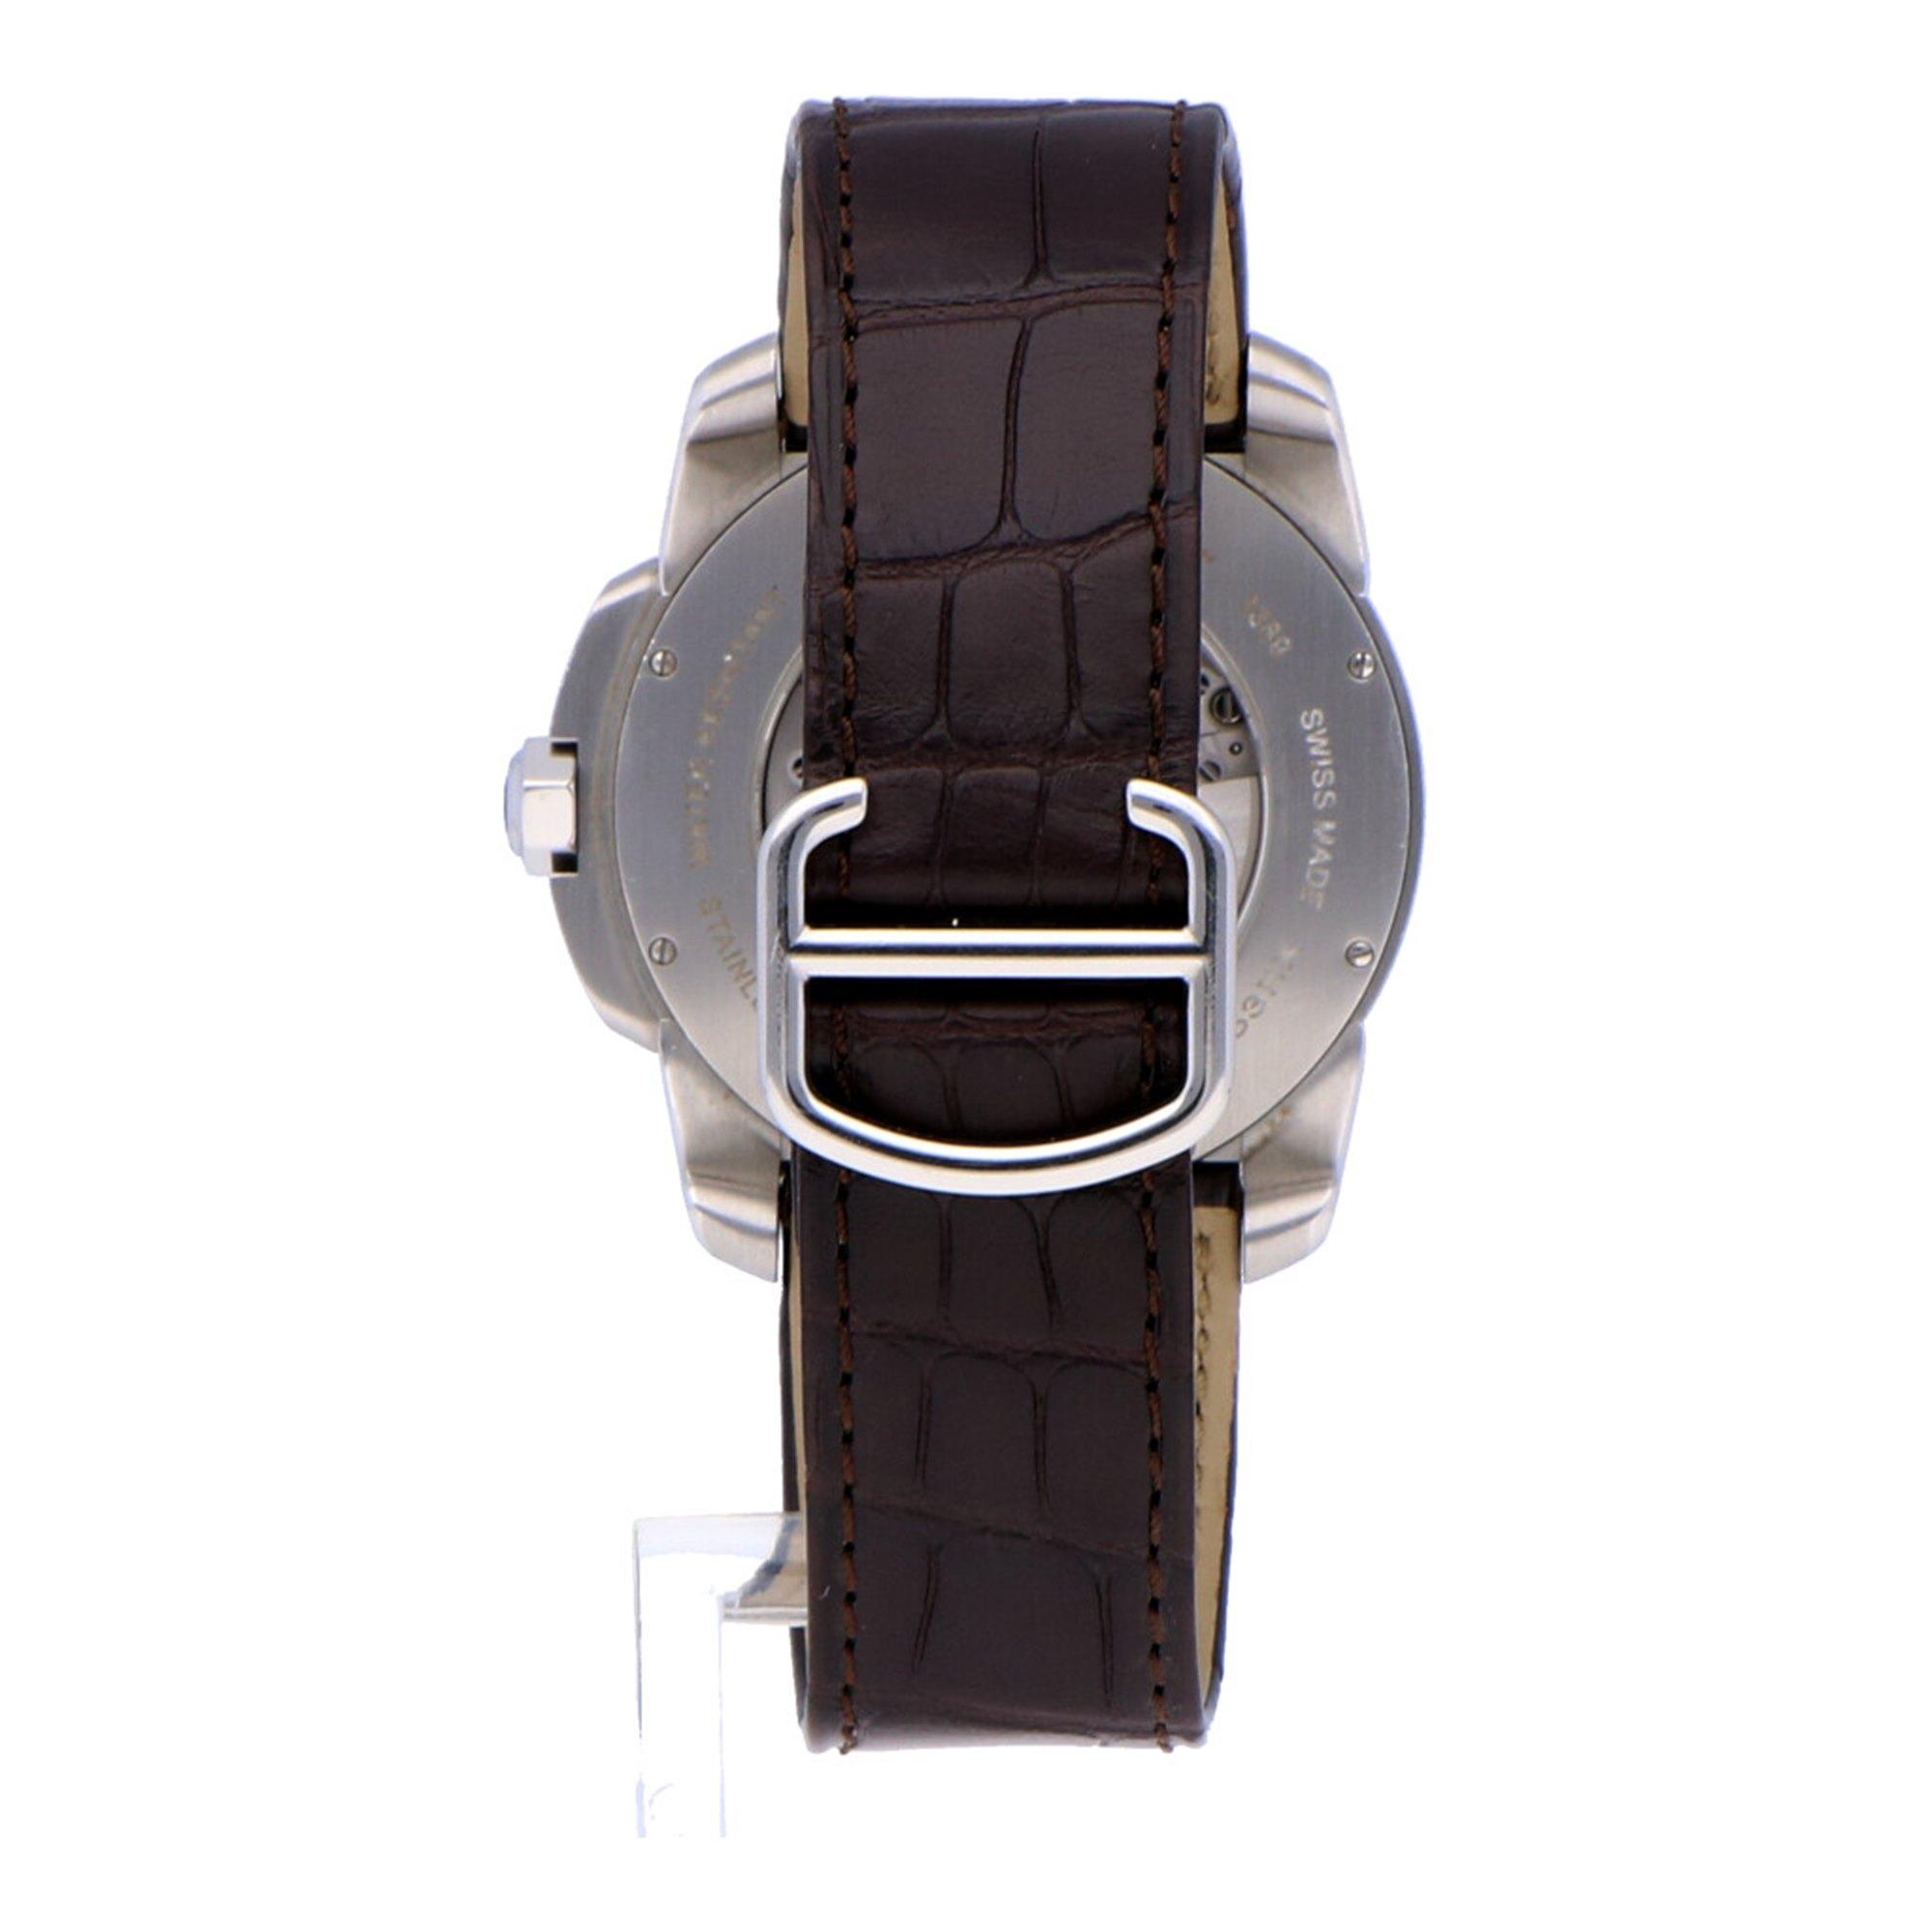 Cartier Calibre De Cartier Stainless Steel & Rose Gold 3389